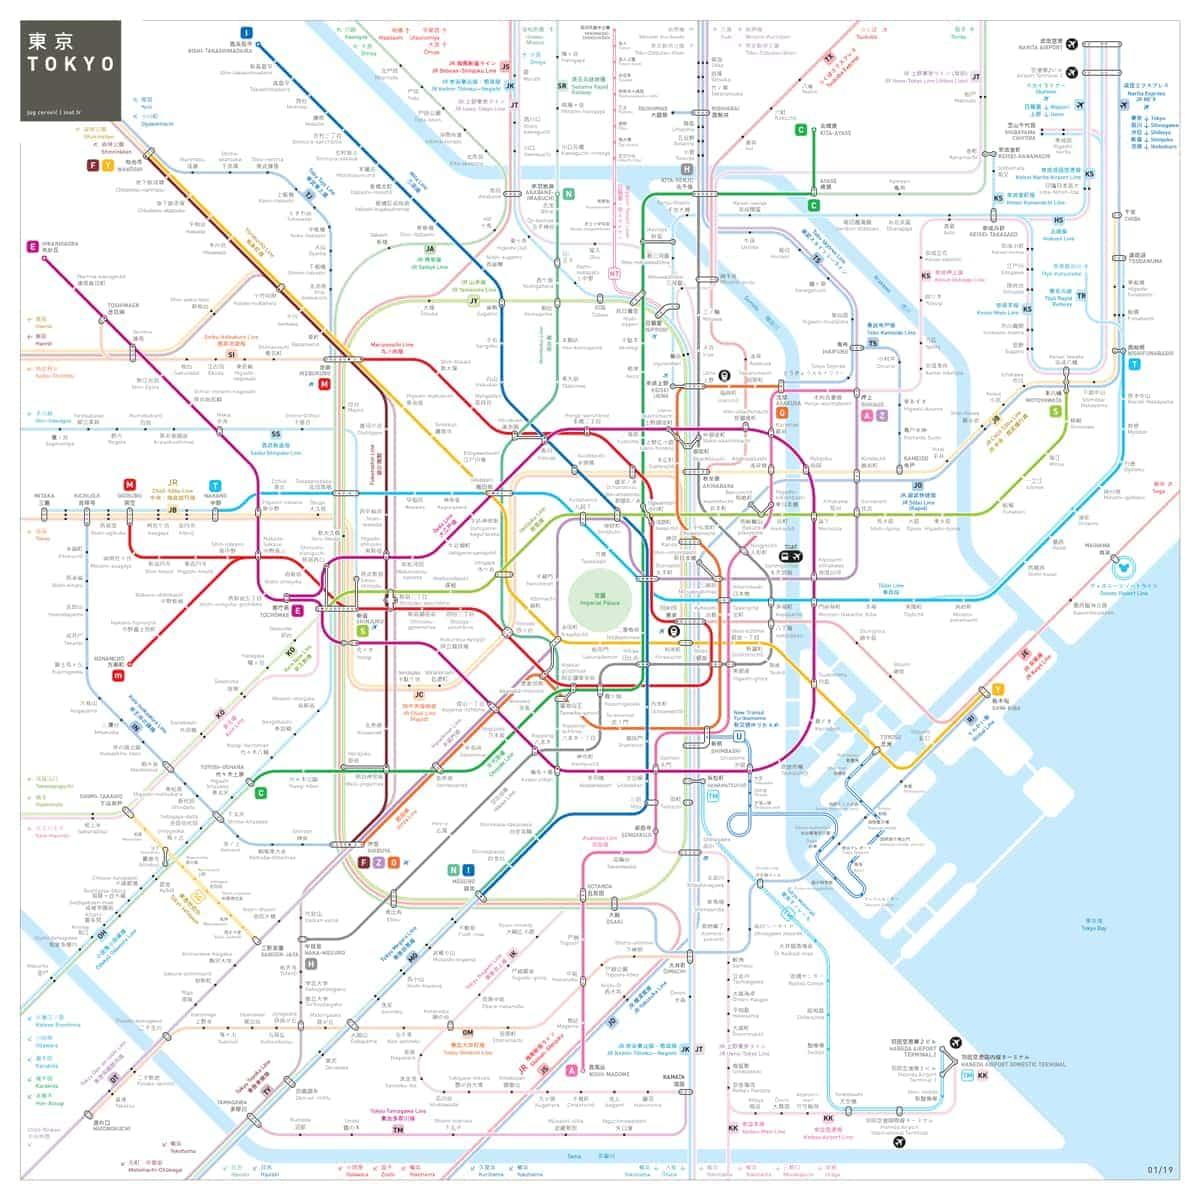 Subway map by Jug Cerovic